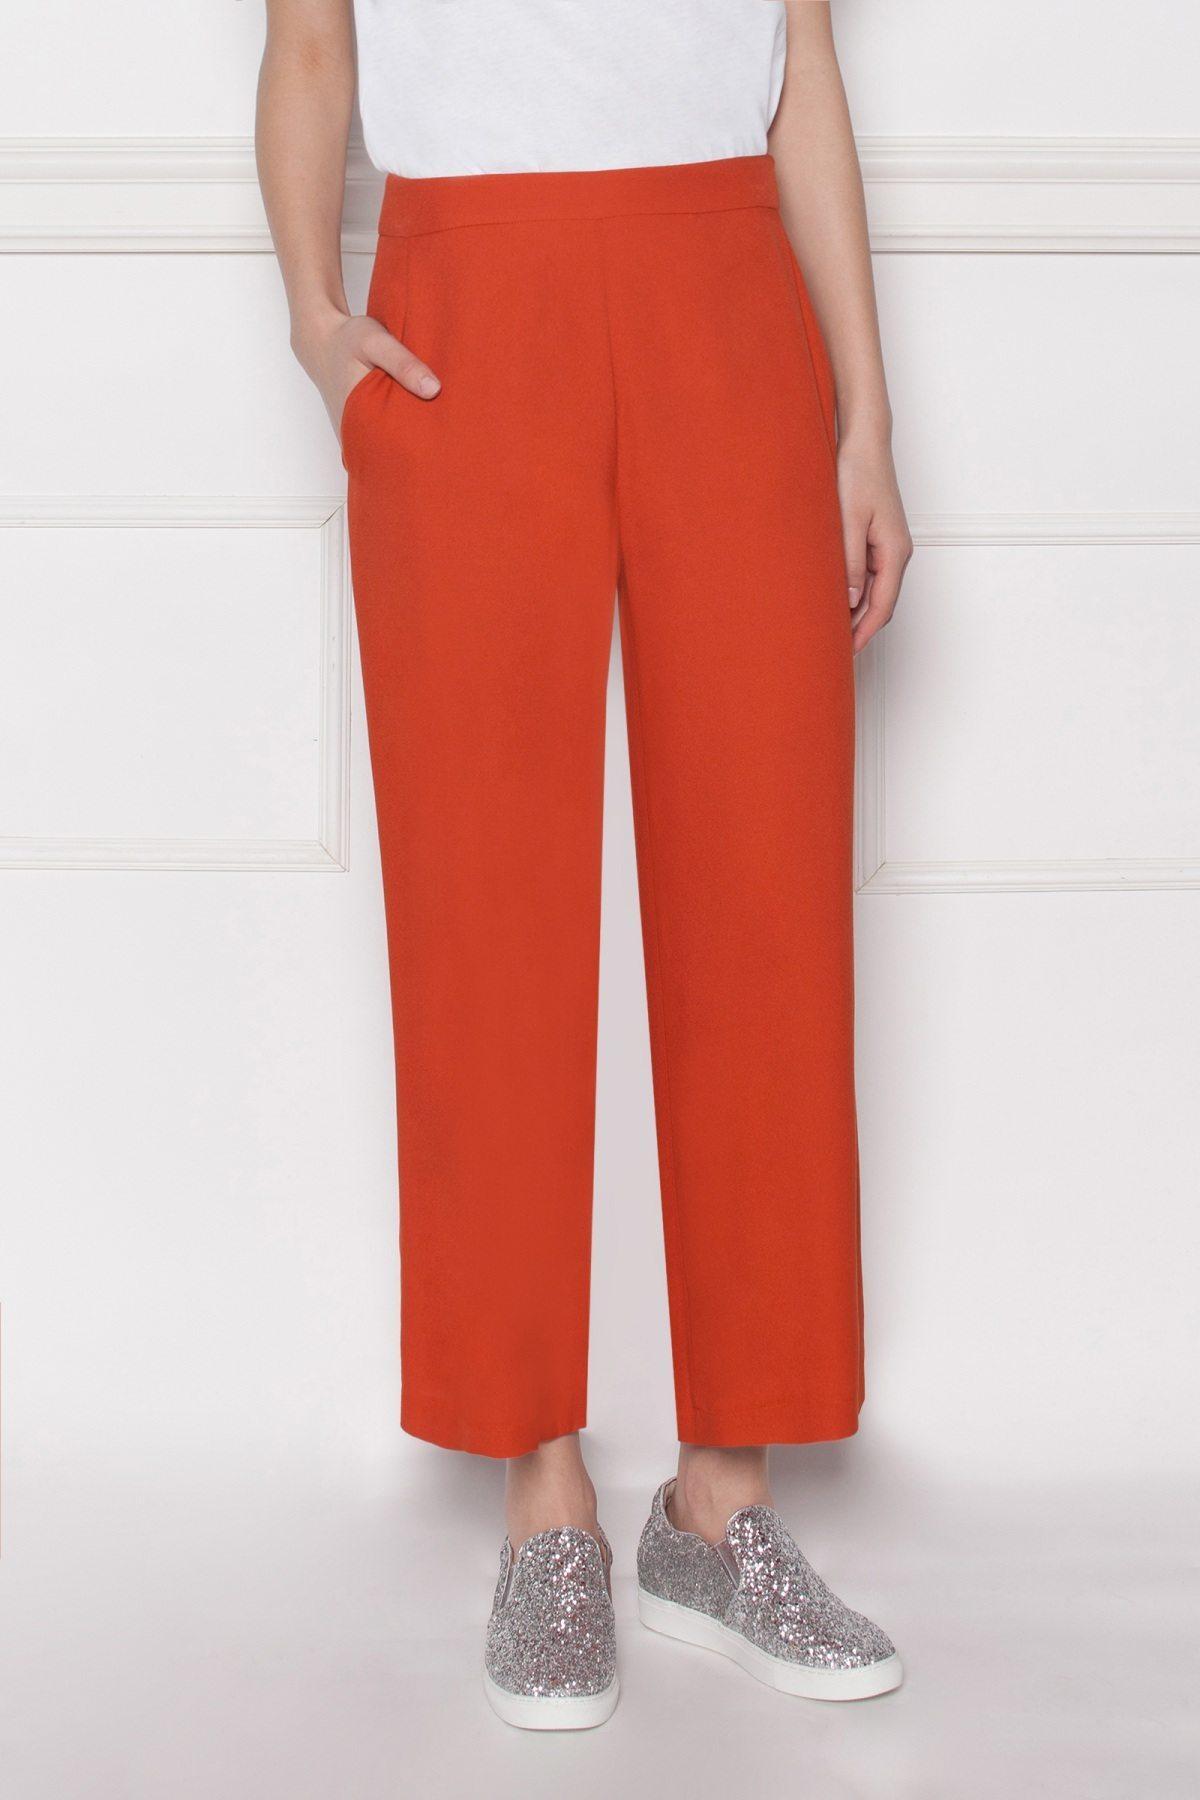 Pantaloni culottes din viscoza Rosu